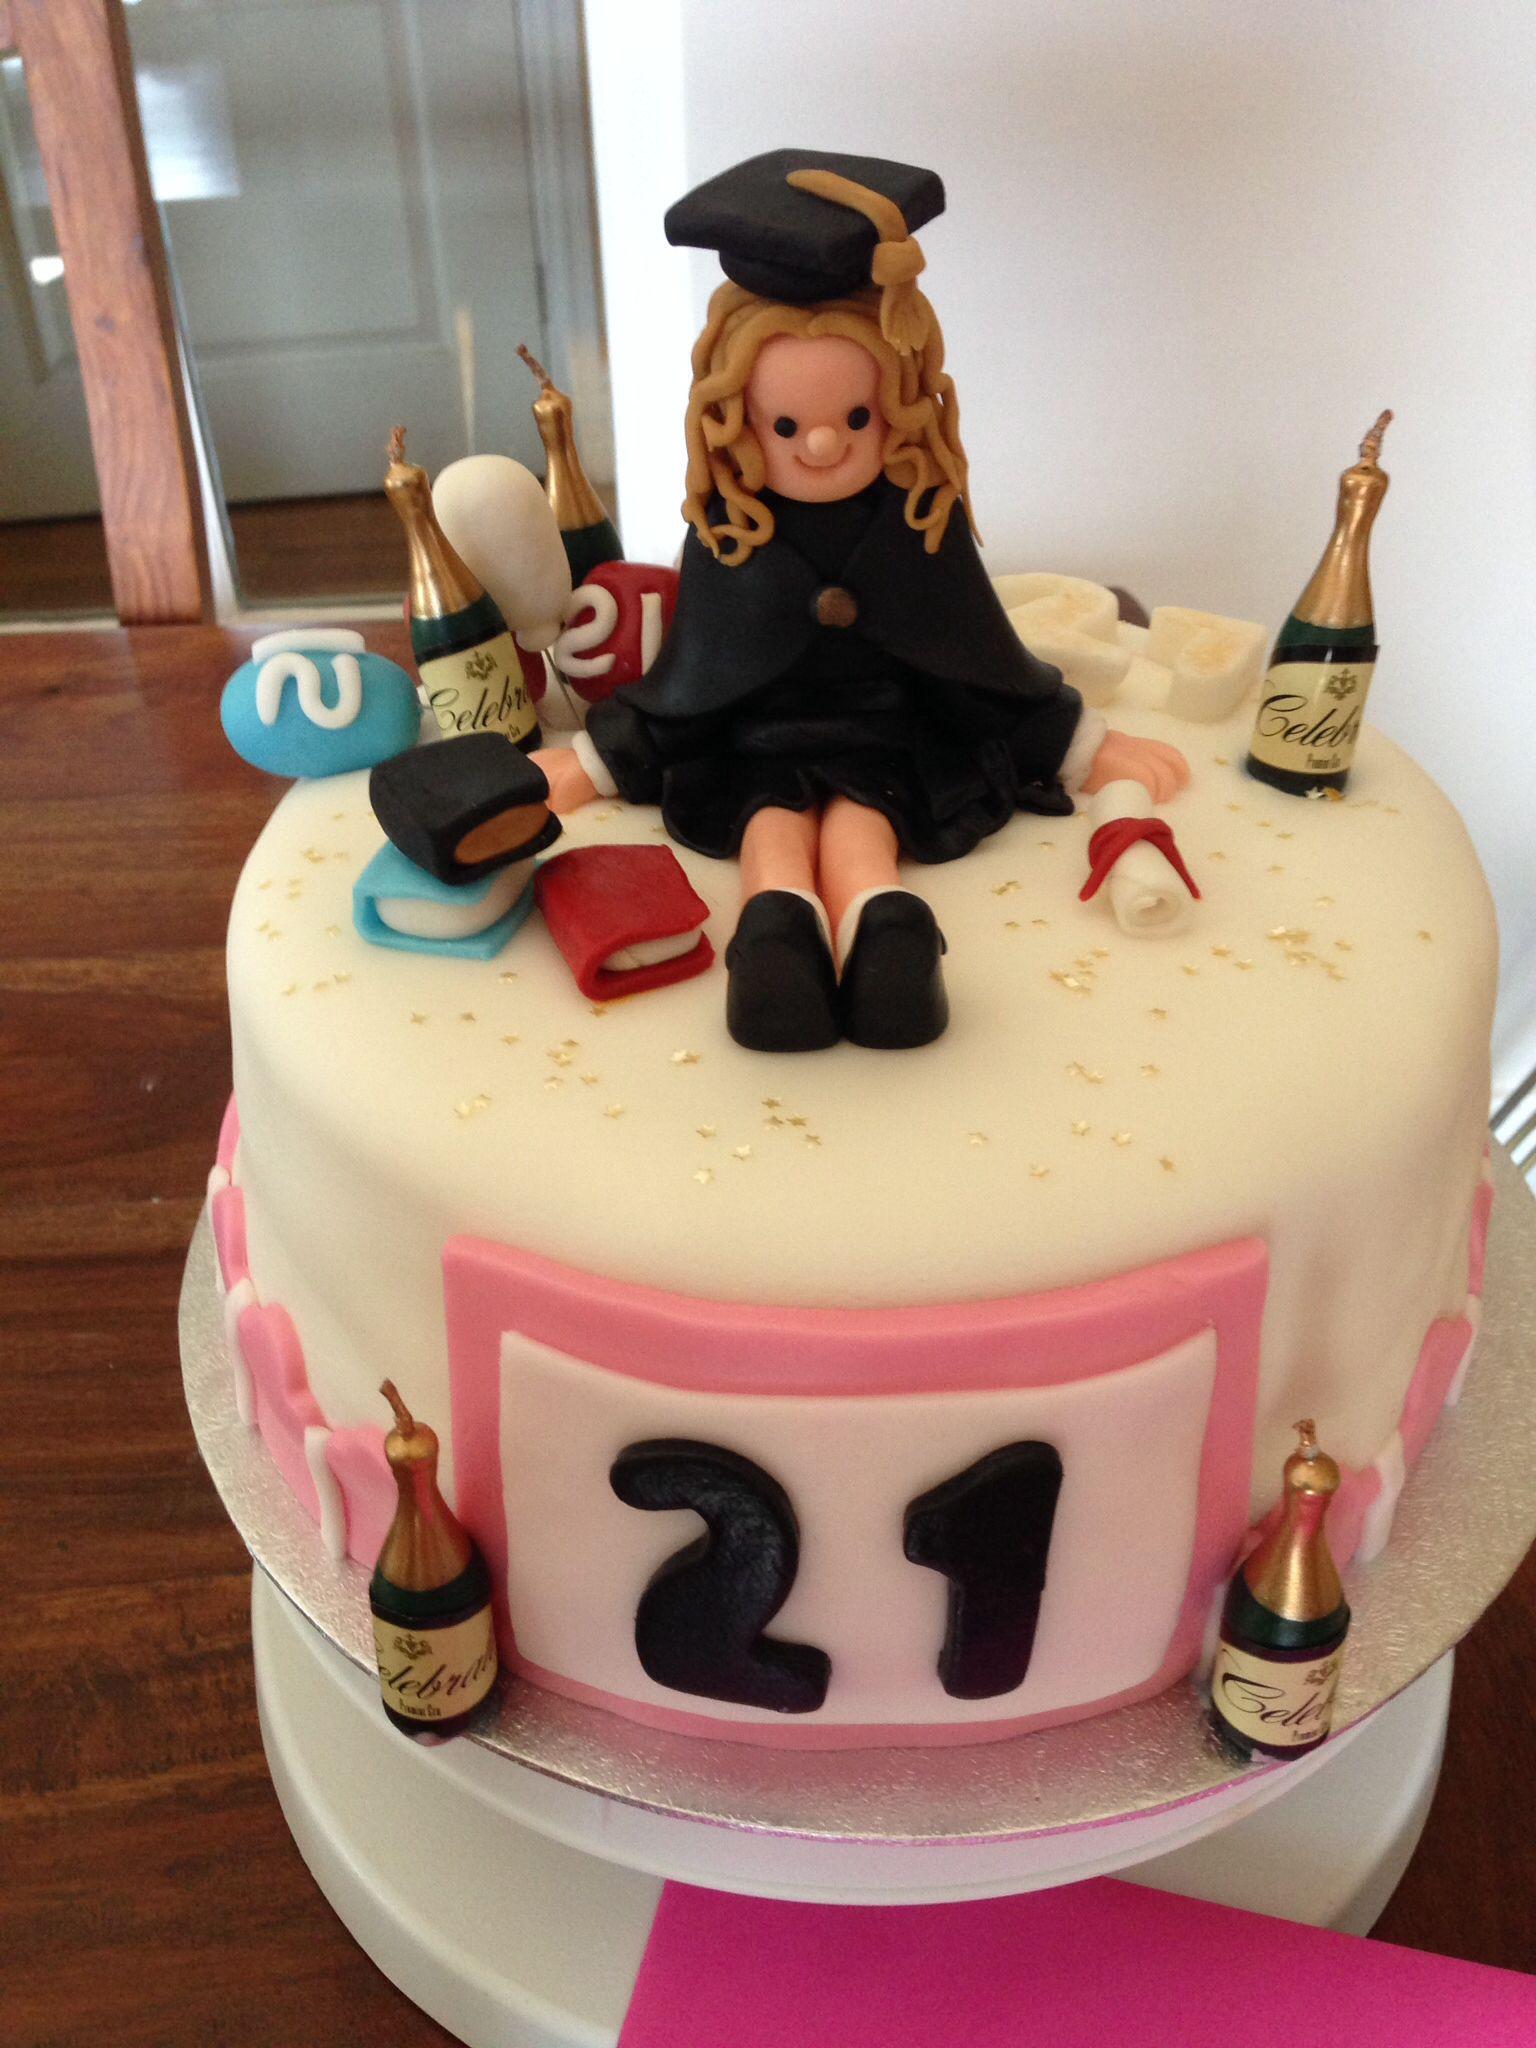 21st Birthday And Graduation Cake Red Velvet My Cakes